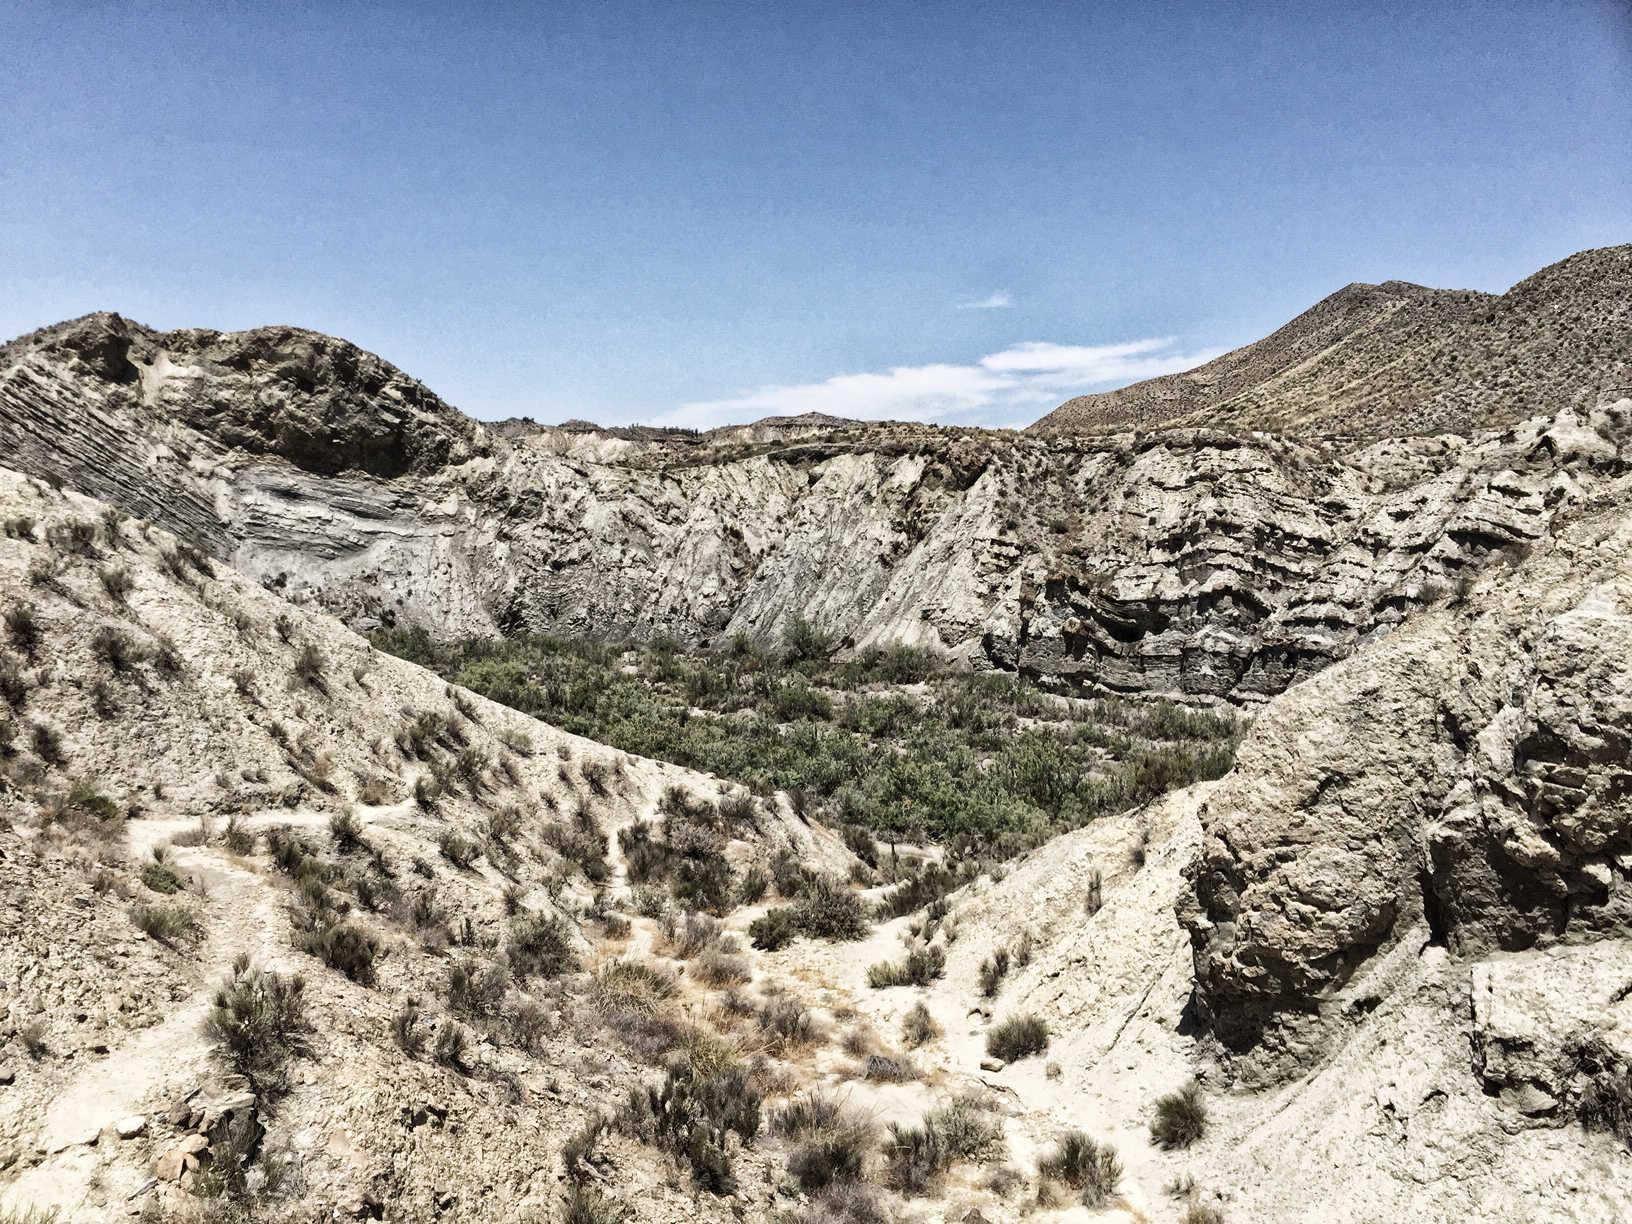 Andalusien Roadtrup durch die Desierto de Tabernas